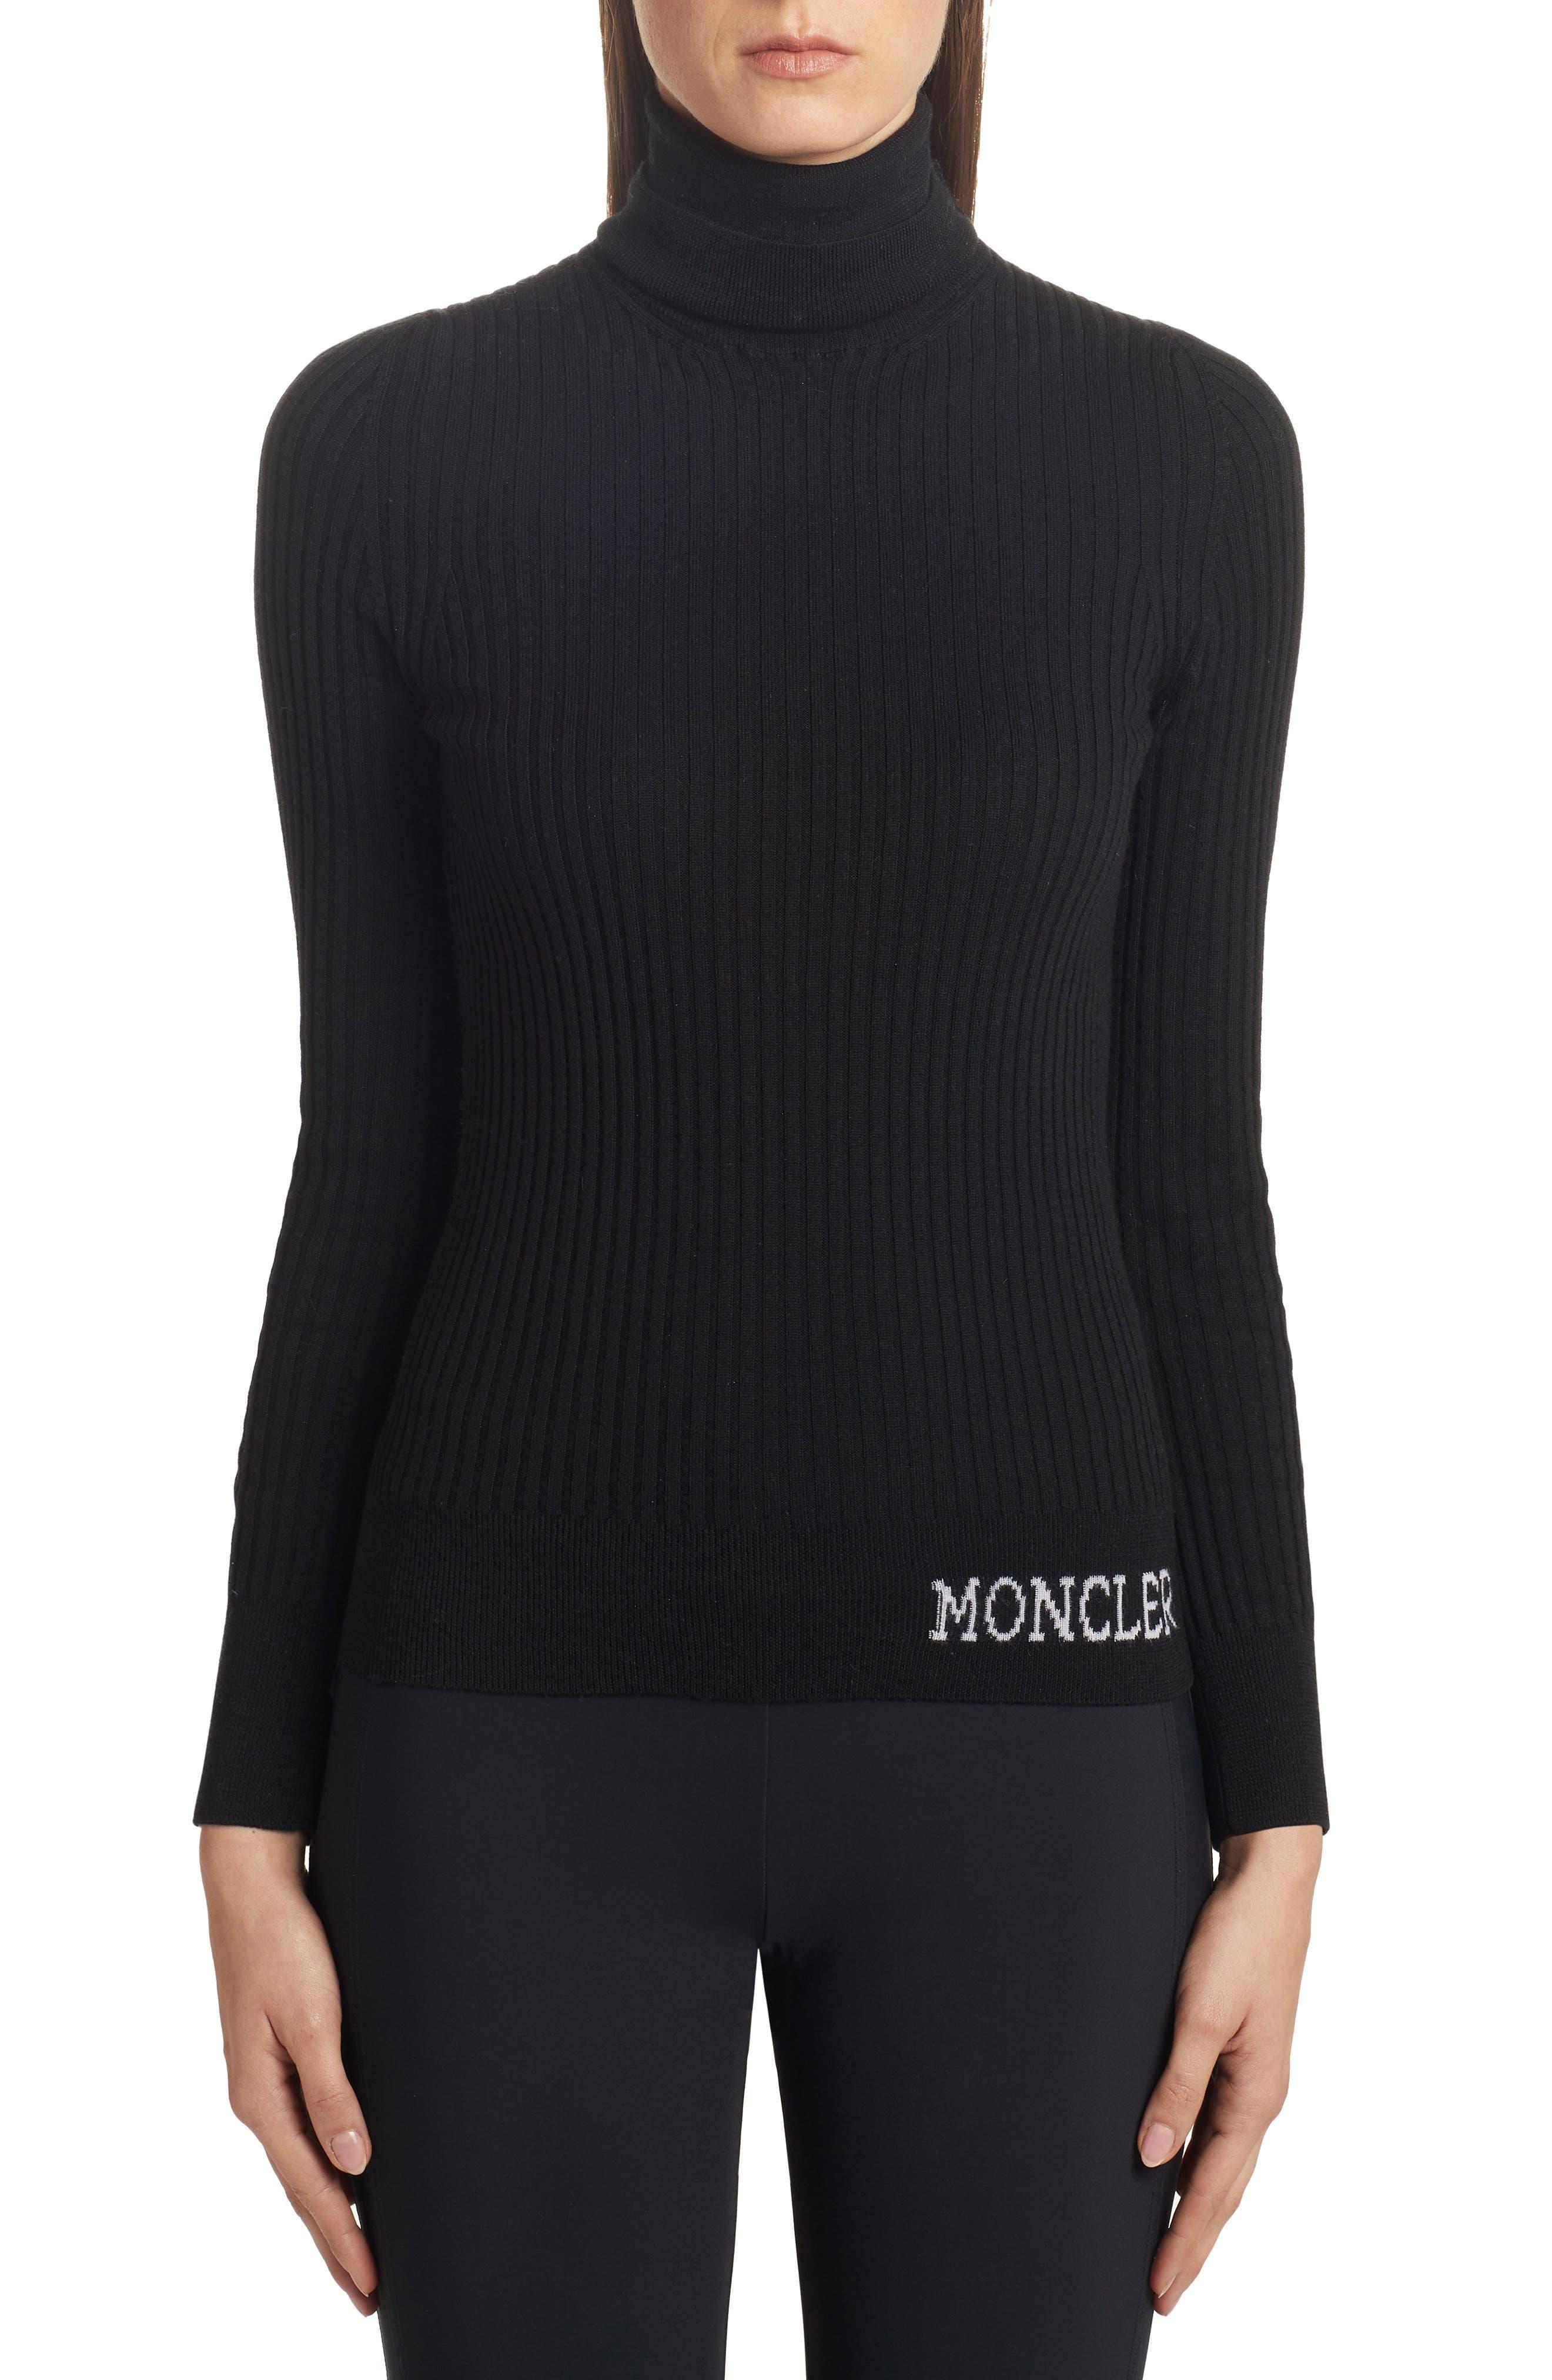 Moncler Tops Logo Turtleneck Sweater